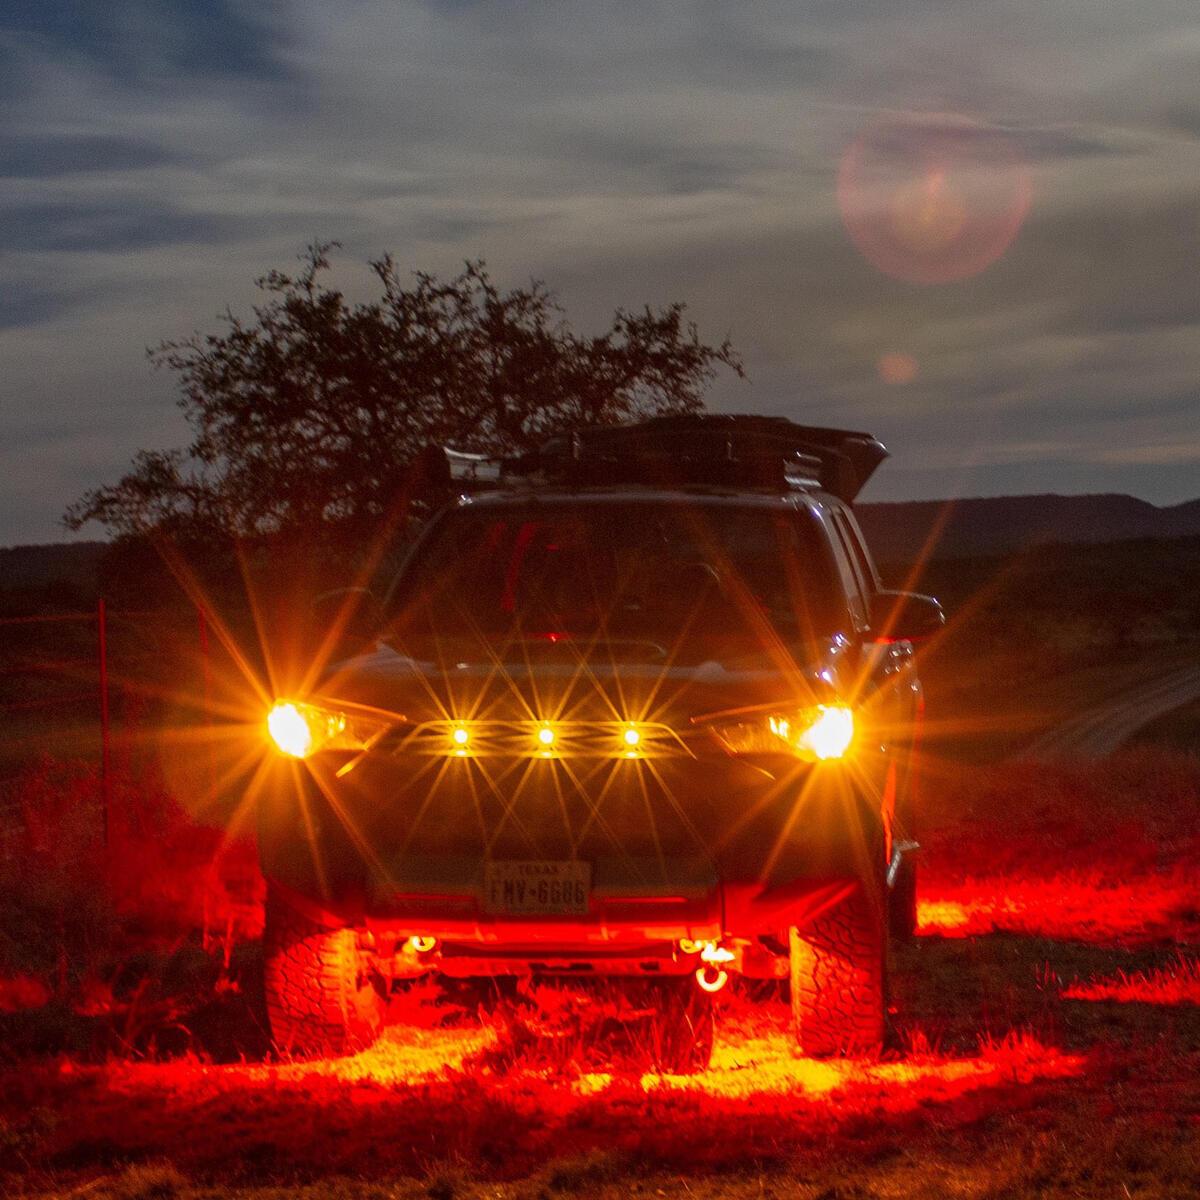 Oznium Brightest Light Bolt - Flush Mount 12V LED Light for Bumper, Grille, Cars Interior, Dash, Ambient Lighting, Motorcycle w/Sleek Aluminum Housing & Screw Nut (11 mm Black, Amber LED)